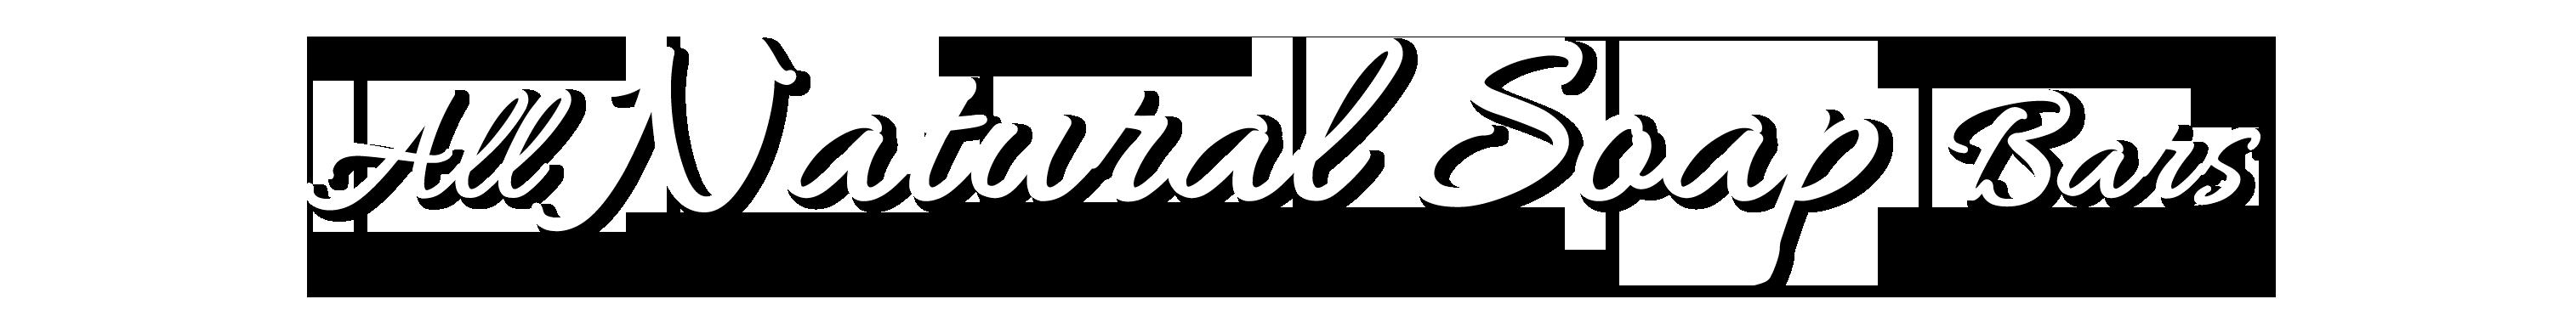 All Natural Herbal, Plant-based Soap Bars & Fragrant Incense Soaps